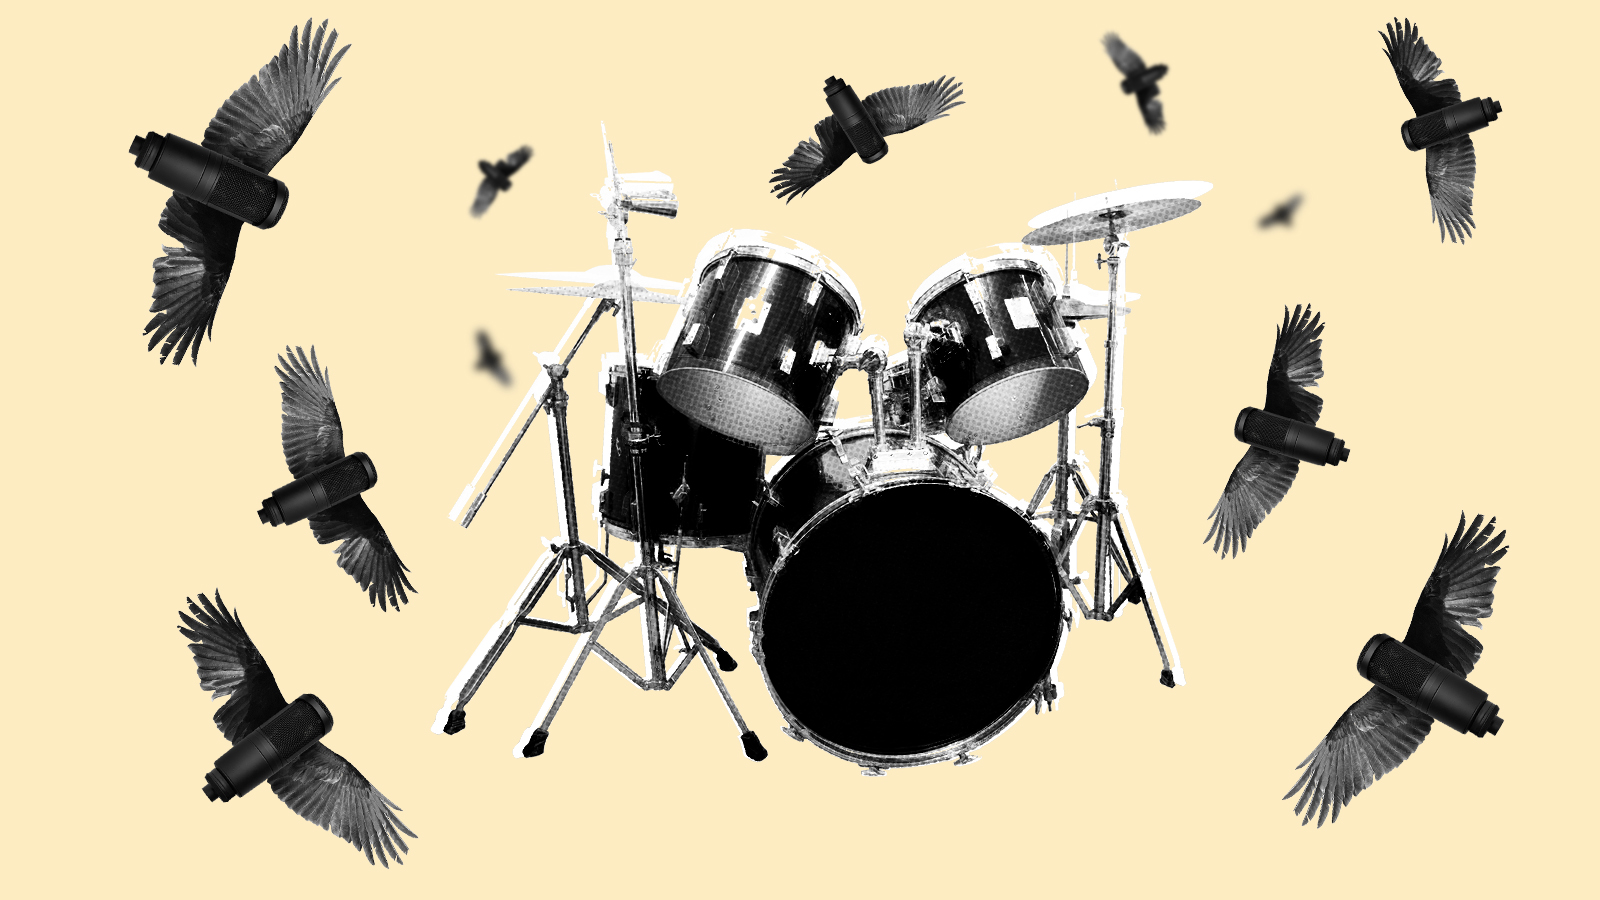 Kris_Crummett_Fundamentals_of_Drum_Tuning_WEB_1600x900_0.jpg